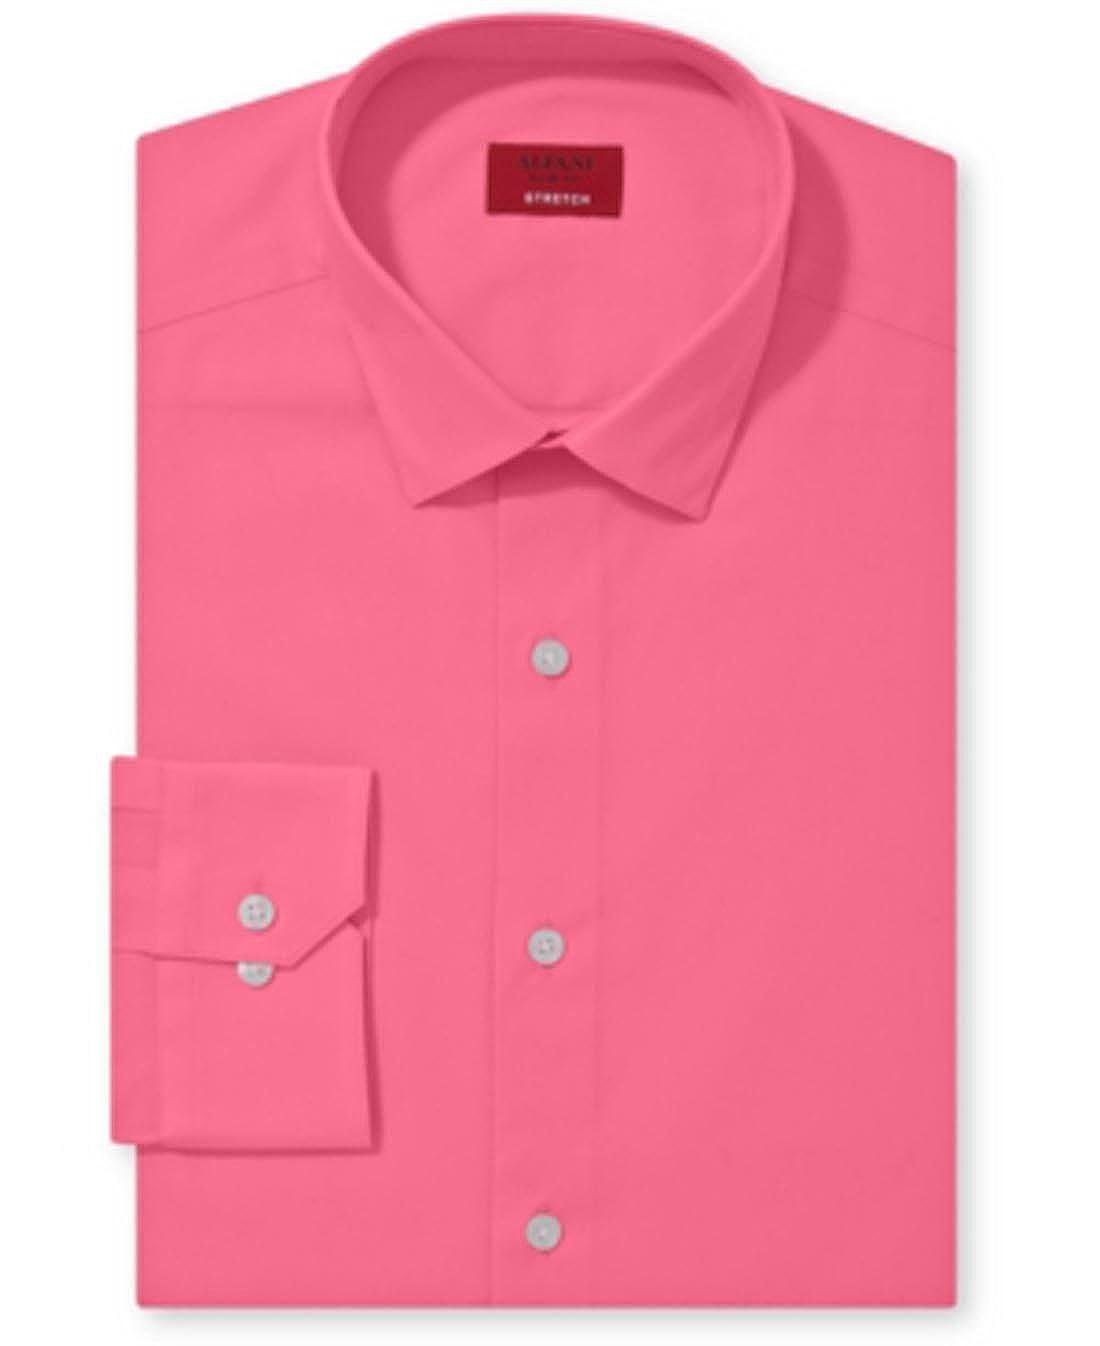 Alfani Spectrum Slim-Fit Solid Dress Shirt Pink Blush at Amazon Men s  Clothing store  9dae5e6387d7